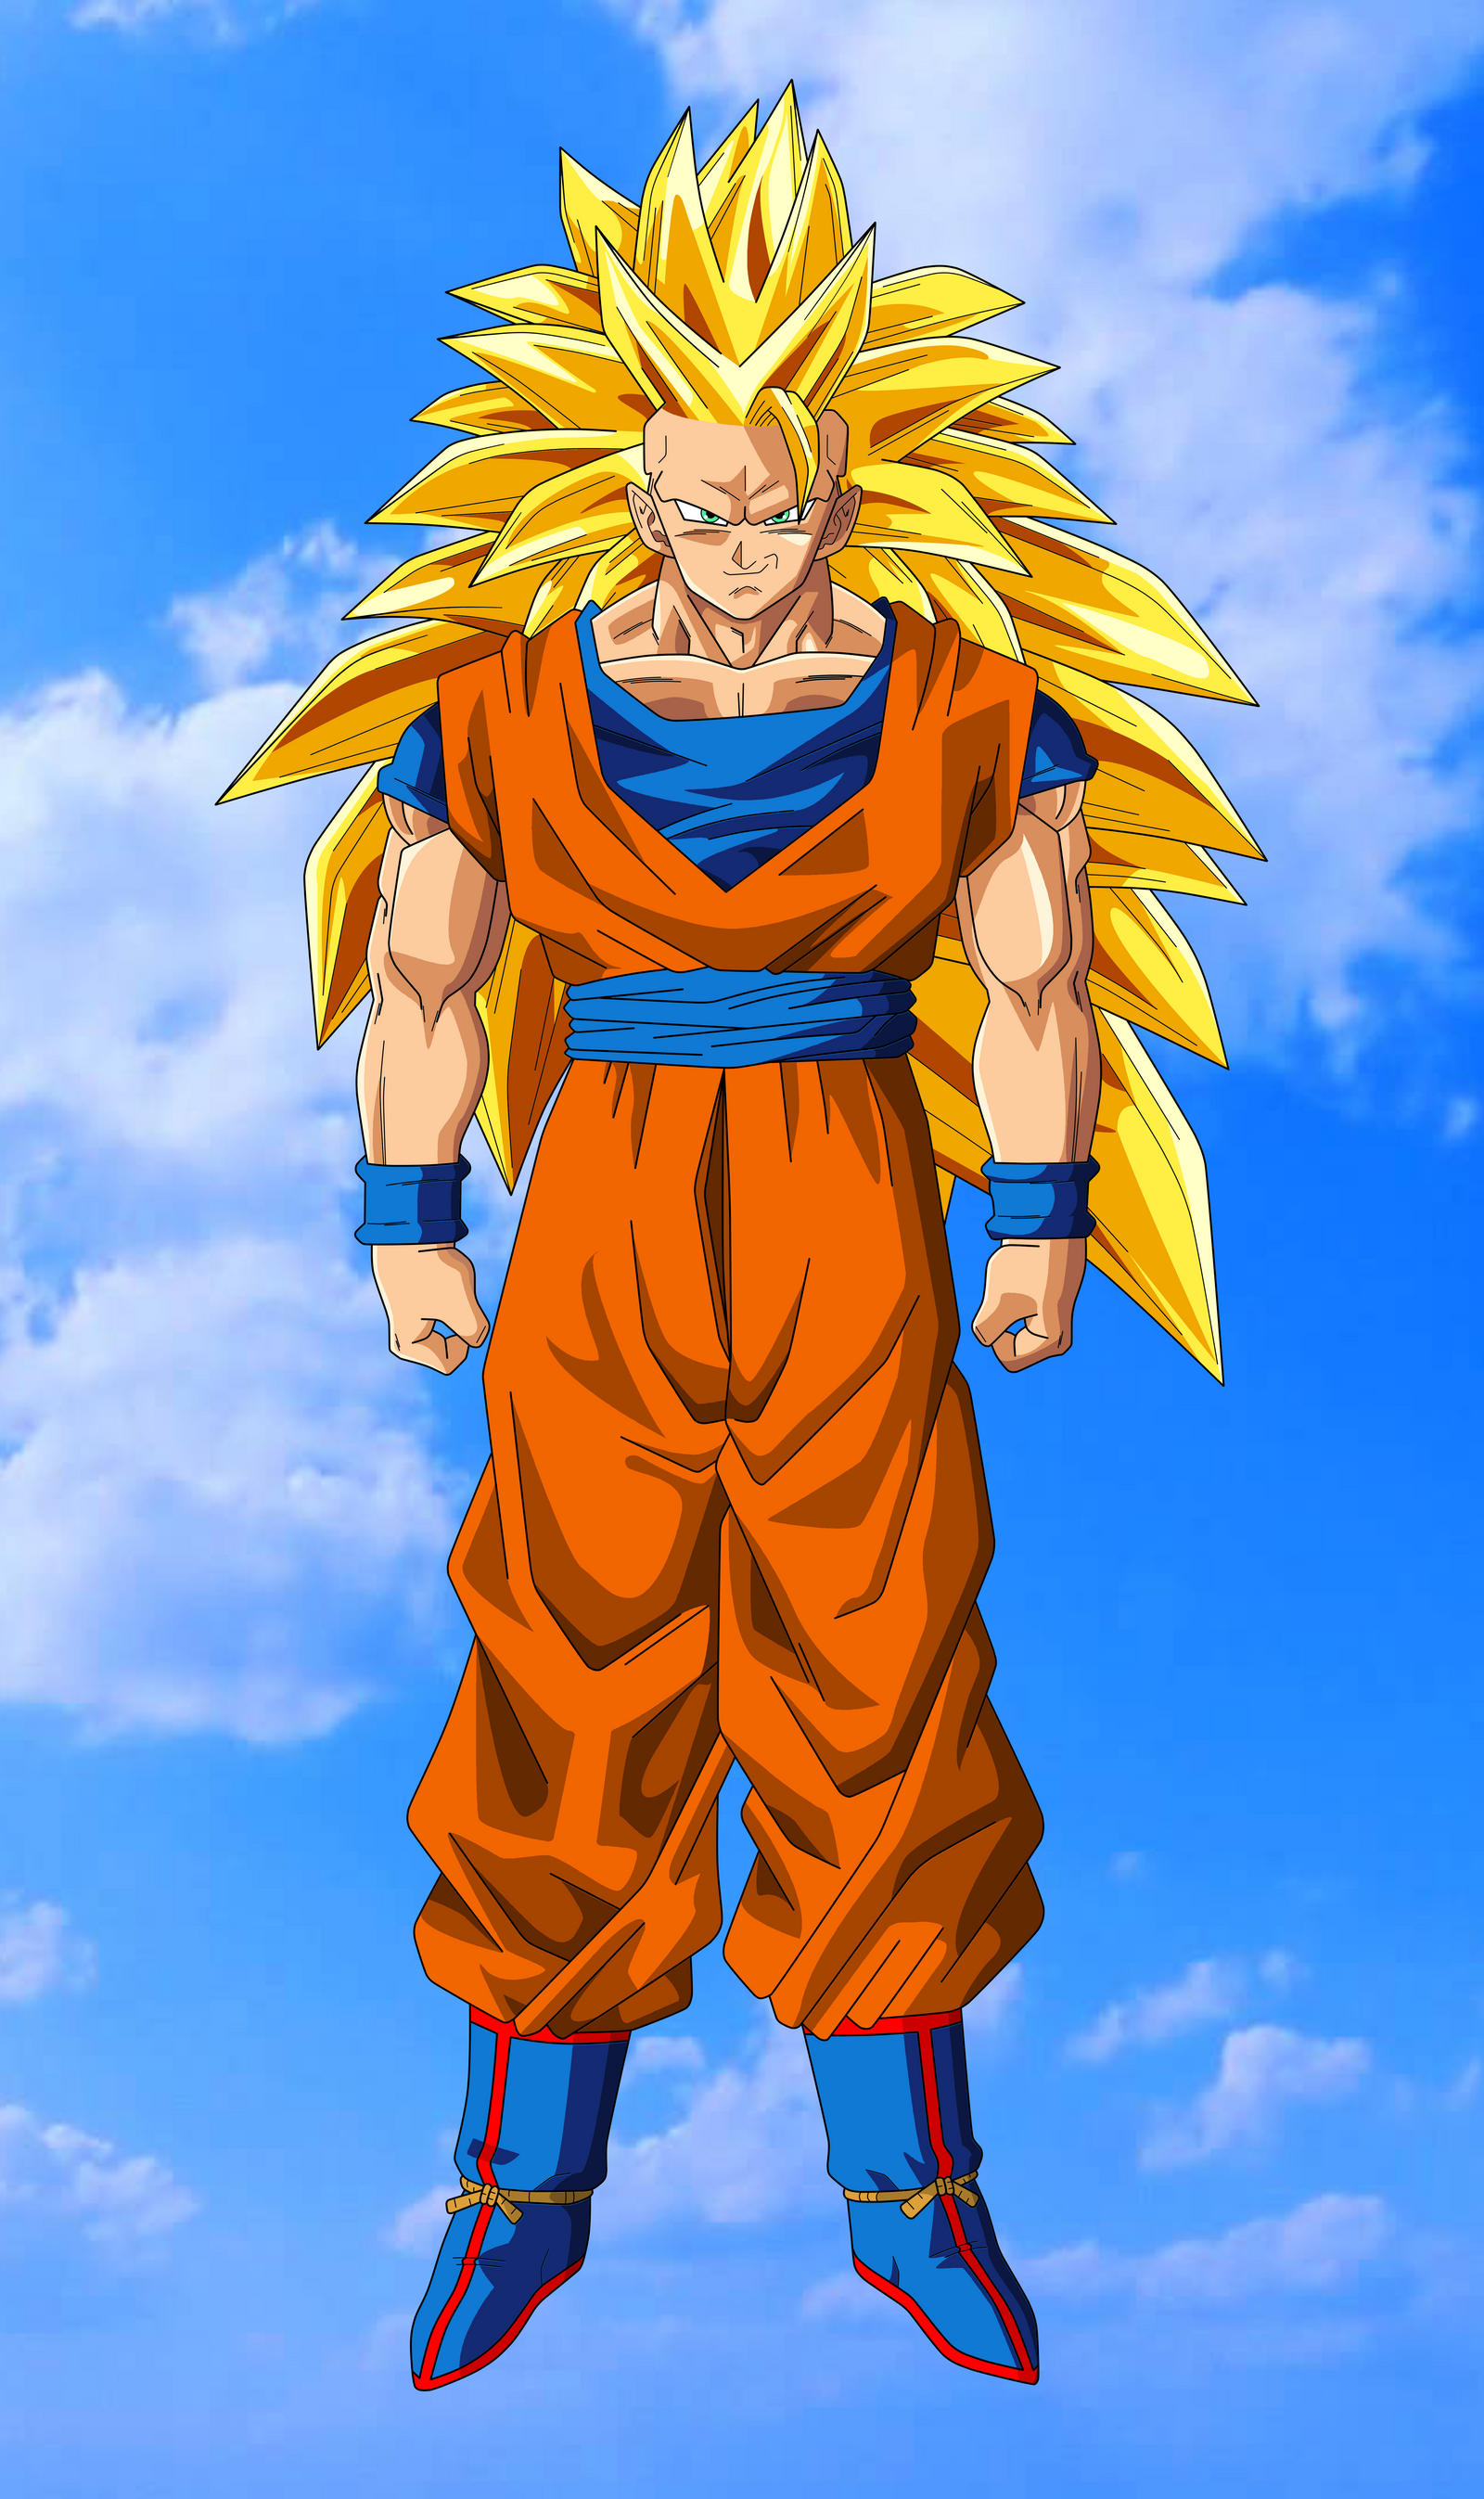 Son goku super saiyan 3 by benj san on deviantart - Sangohan super saiyan 3 ...